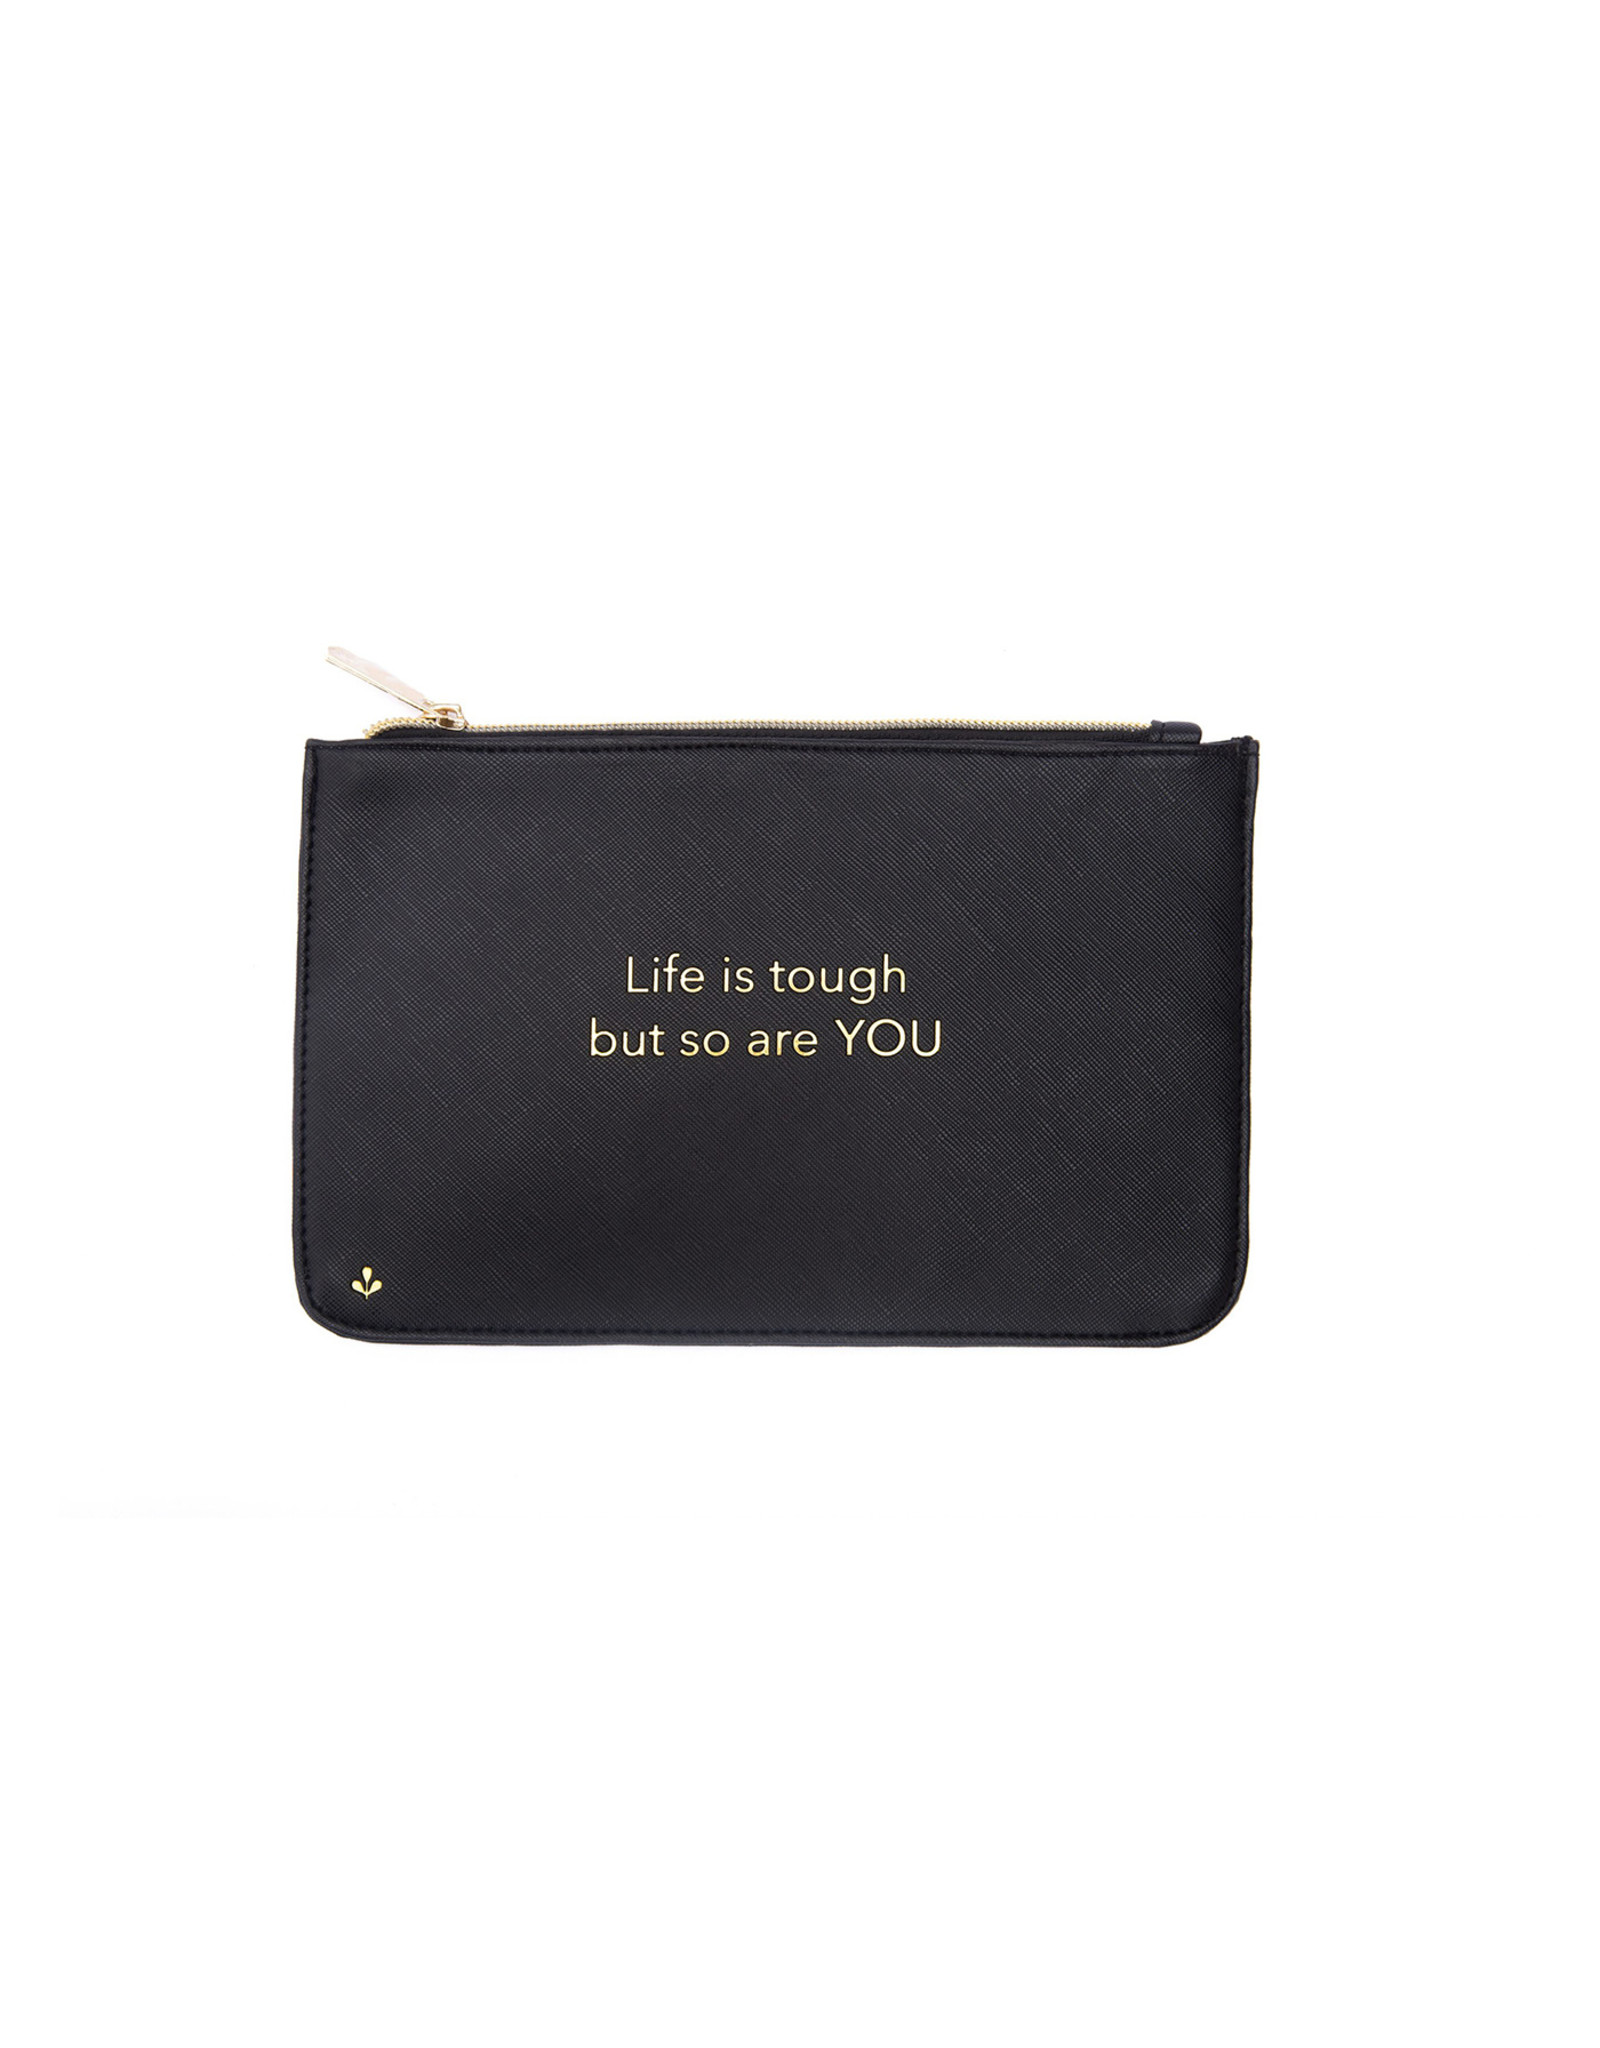 Splendid Iris 8x5 Zipper Pouch - Life Is Tough - Black